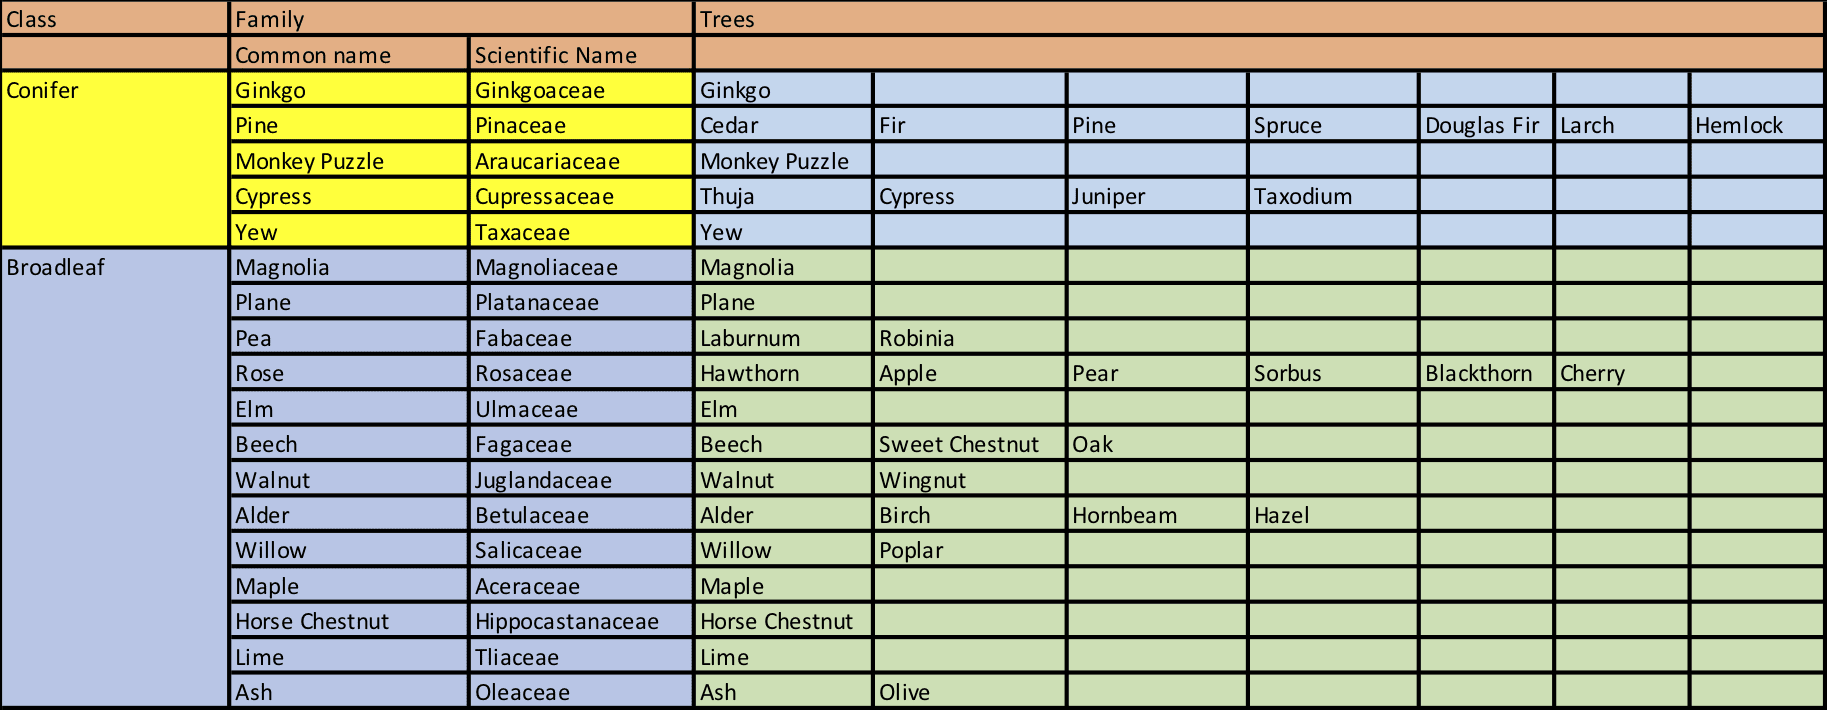 tree families